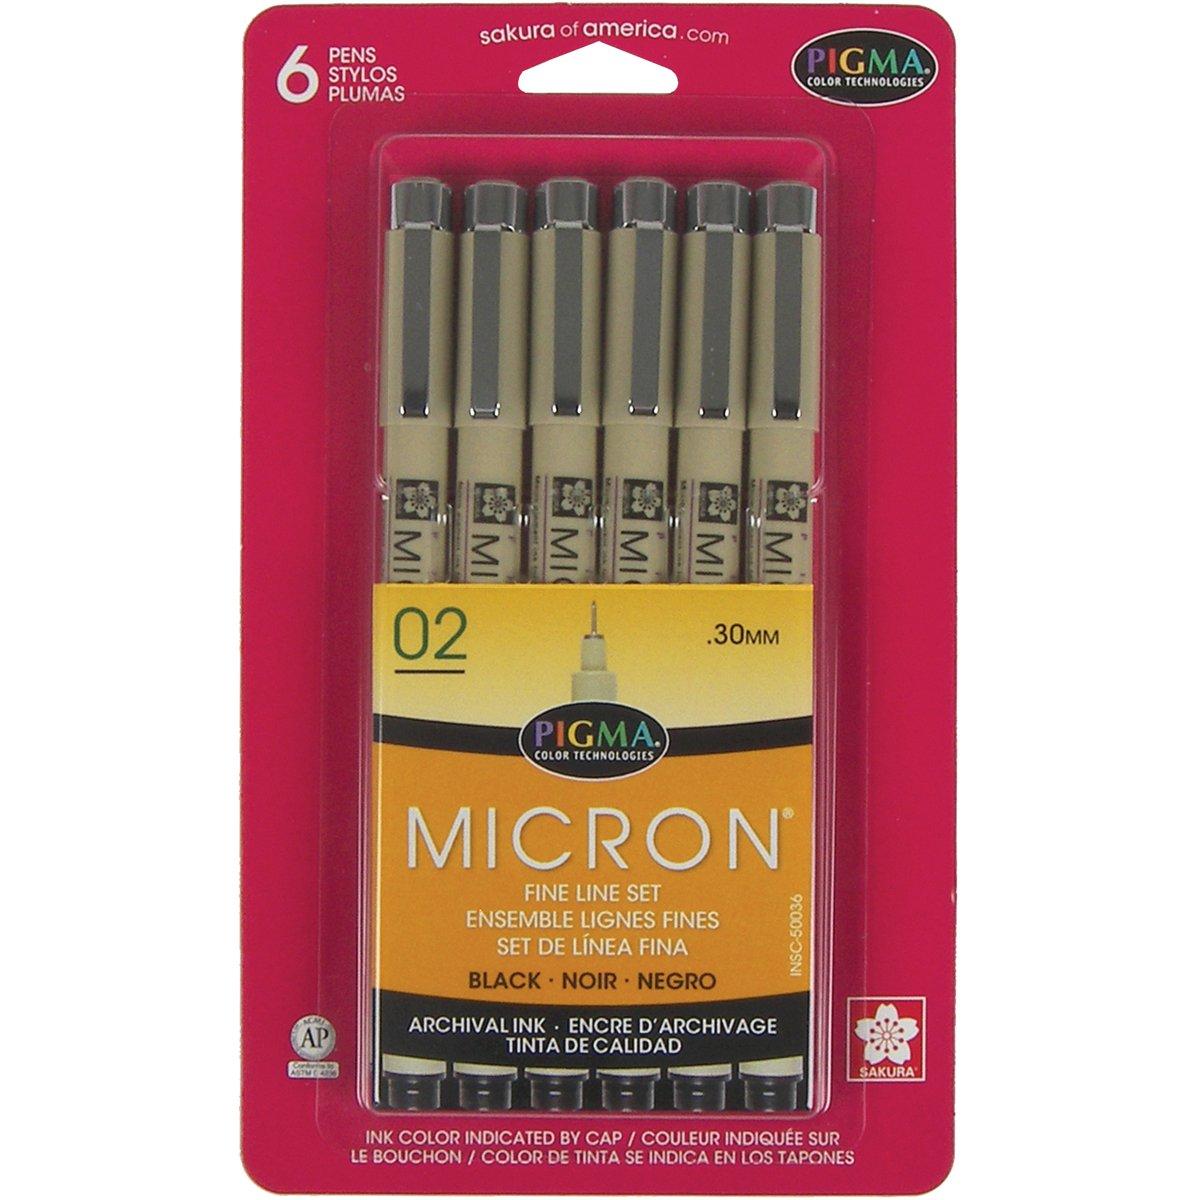 Sakura Pigma 50036 Micron Blister Card Ink Pen Set, Black, 02 6CT